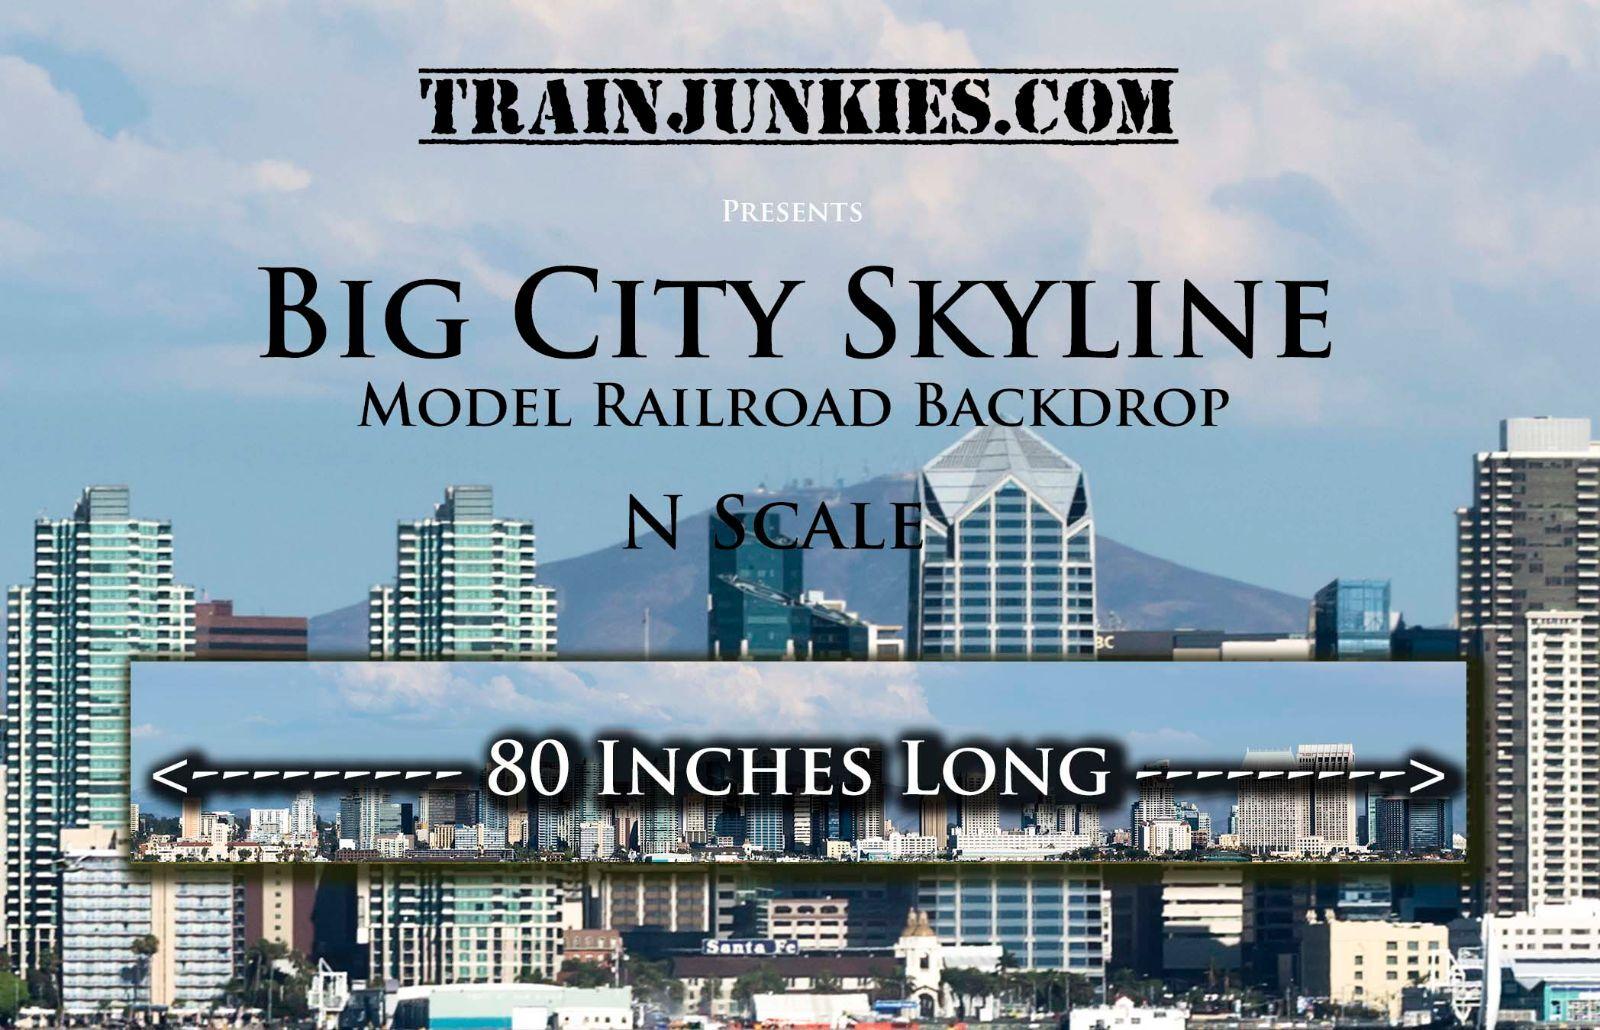 Trainjunkies N Scale Gran Ciudad Skyline modelo del ferrocarril telón de fondo 12x80